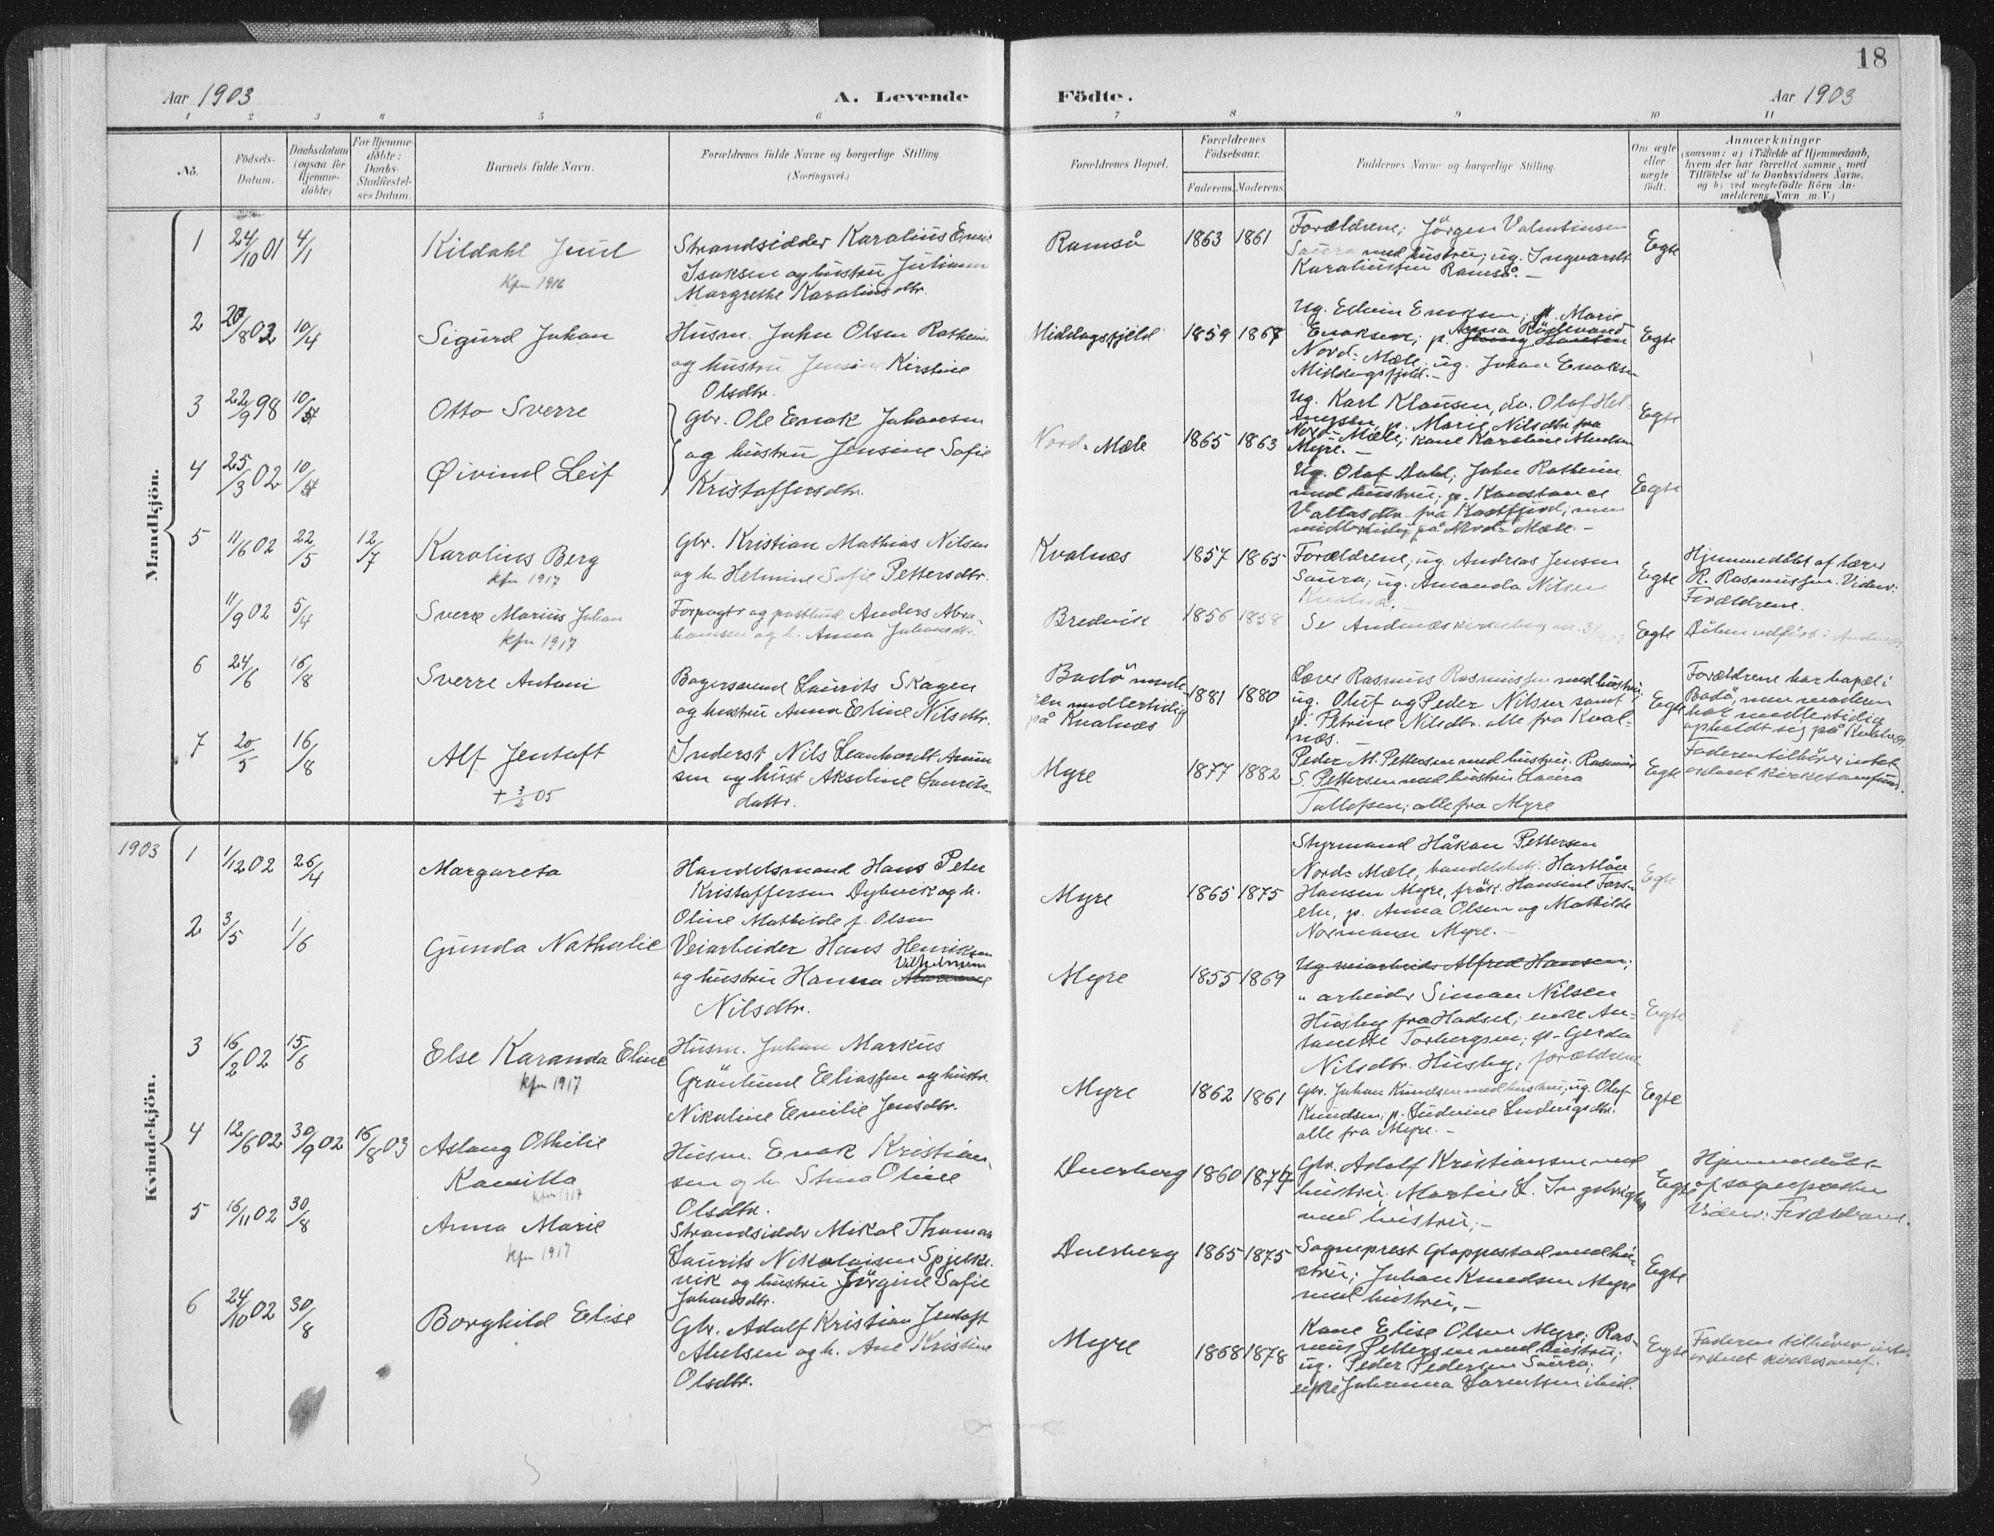 SAT, Ministerialprotokoller, klokkerbøker og fødselsregistre - Nordland, 897/L1400: Ministerialbok nr. 897A07, 1897-1908, s. 18